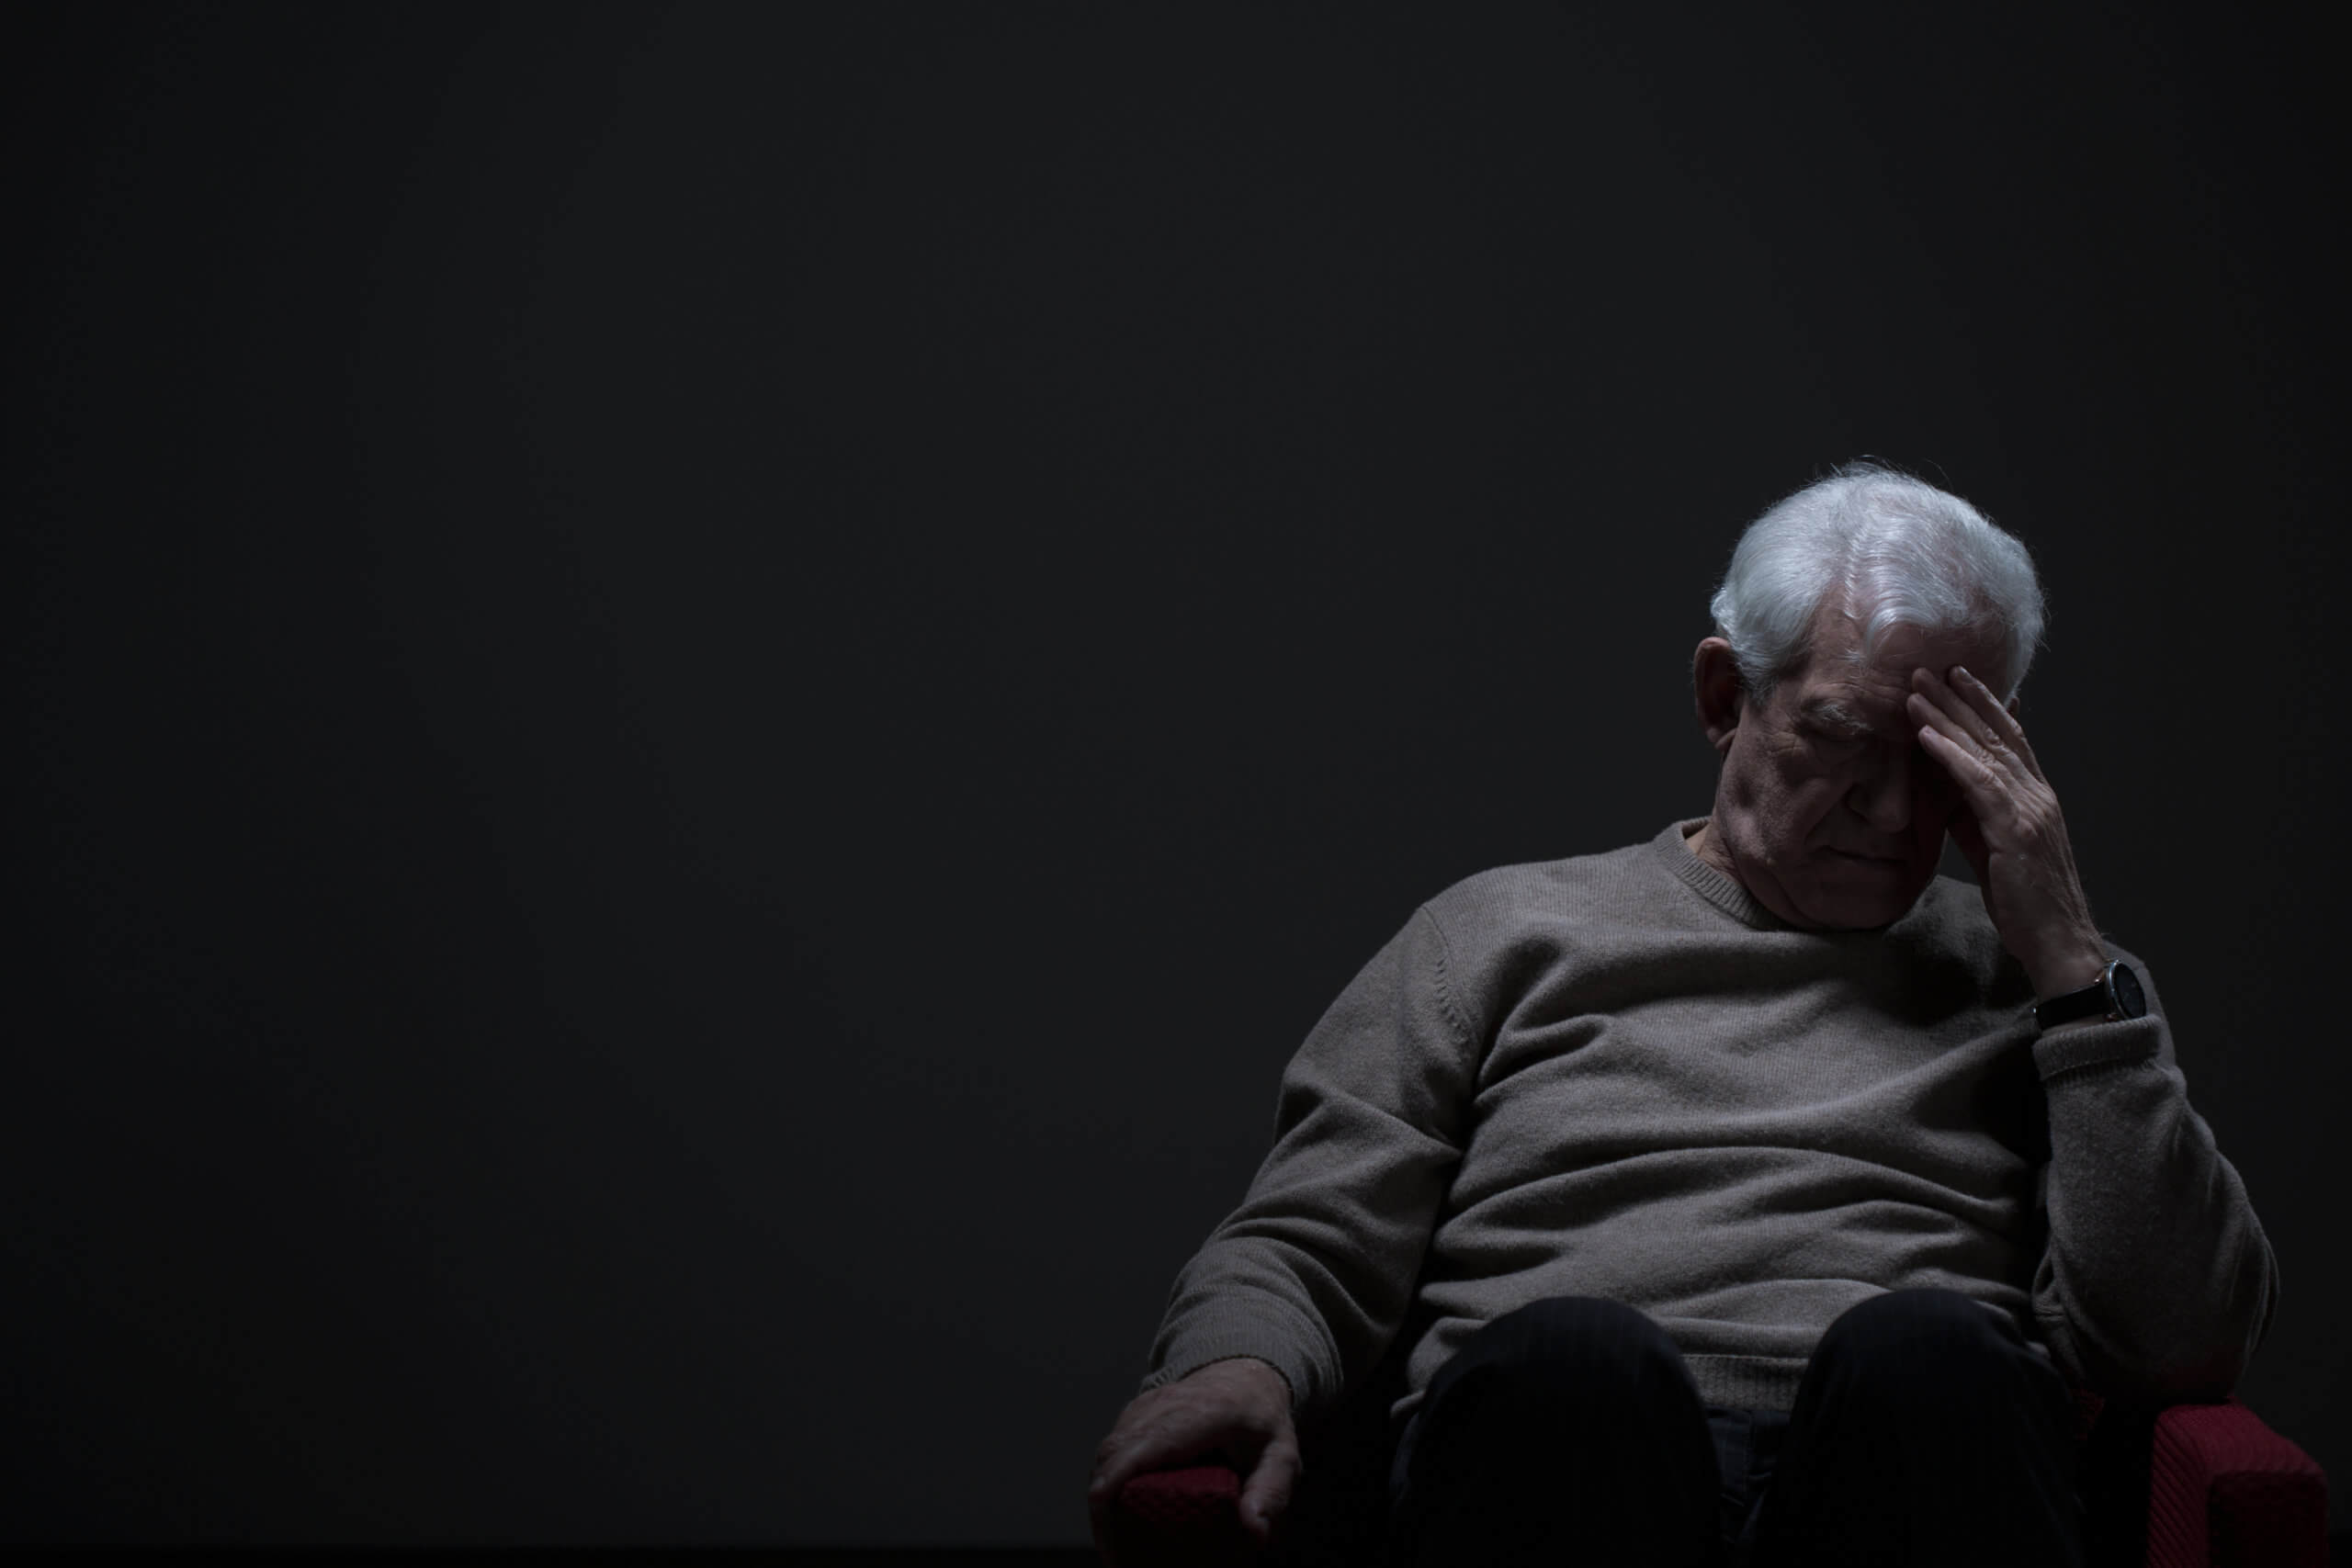 Types of Elder Abuse